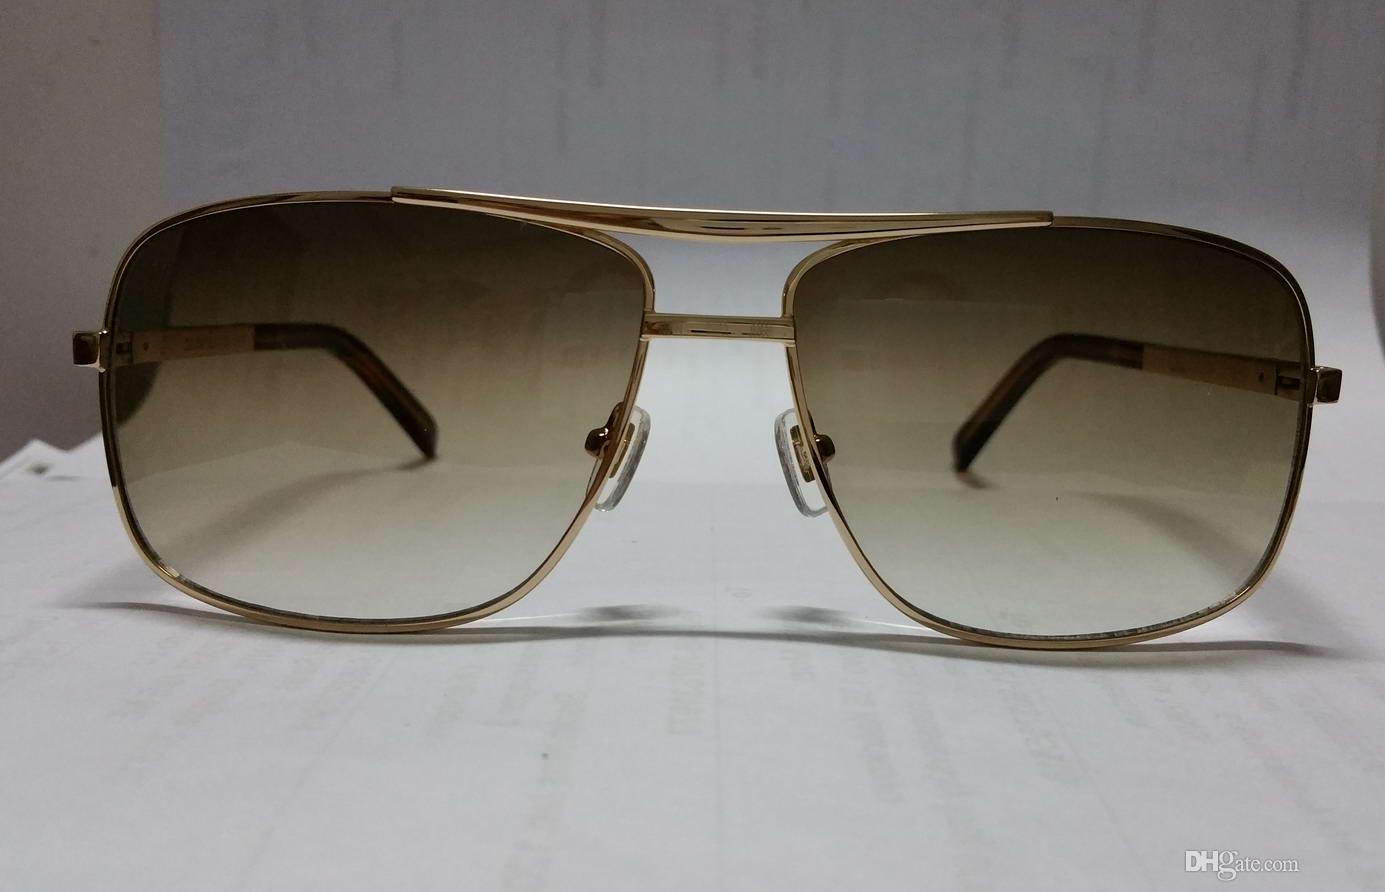 Mens Square Attitude Pilote Gold Brown Sunglasses Sonnenbrille Z0256u Designer Brand Sunglasses Eyewear New With Box